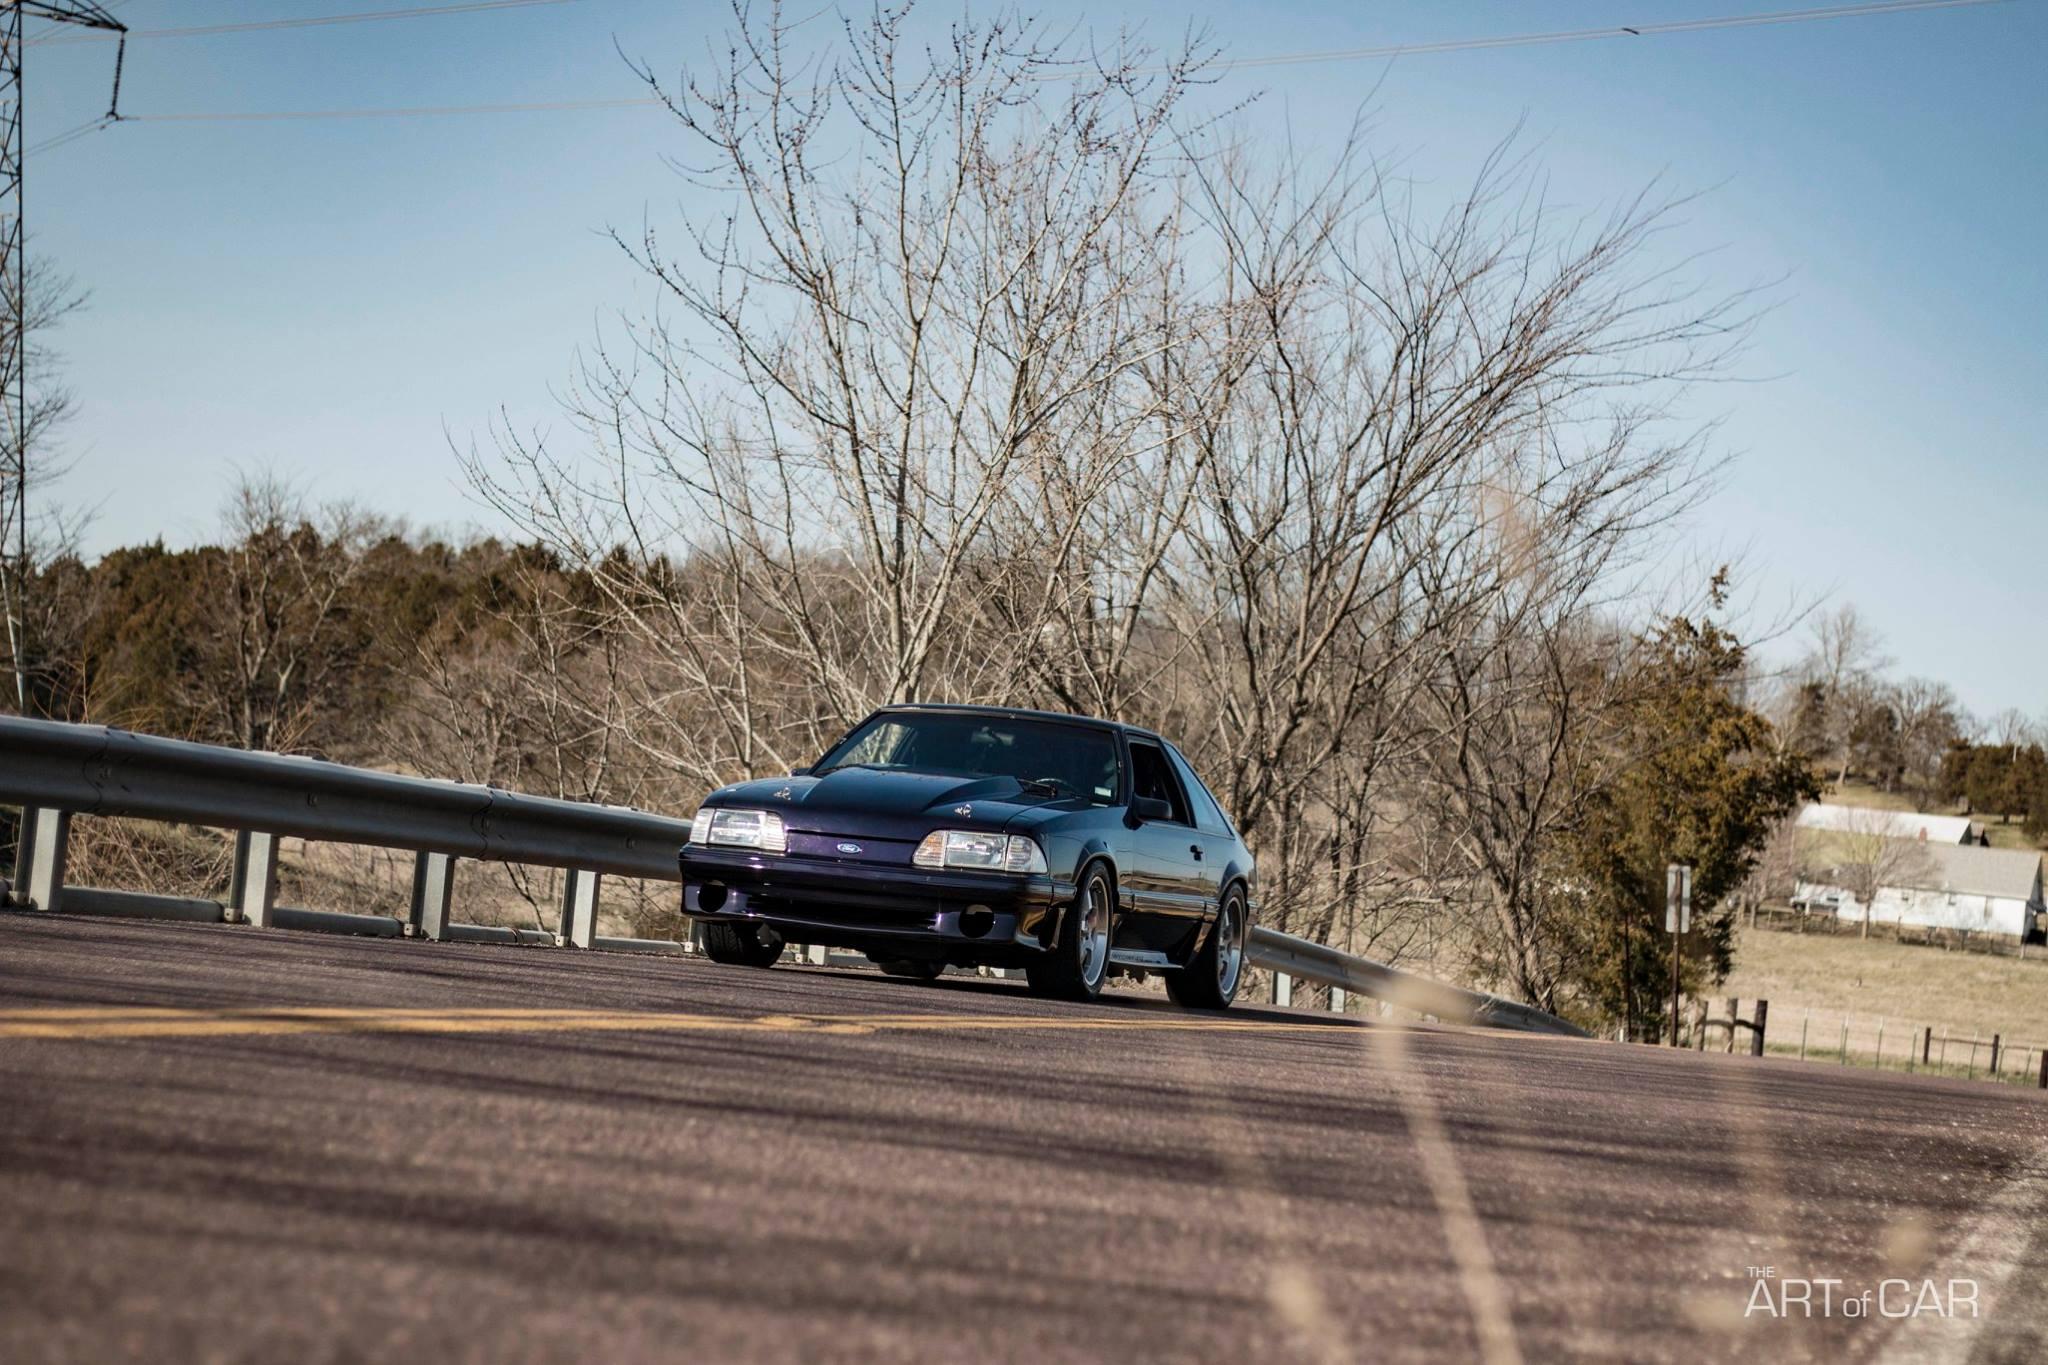 Modded America Fox Body Mustang